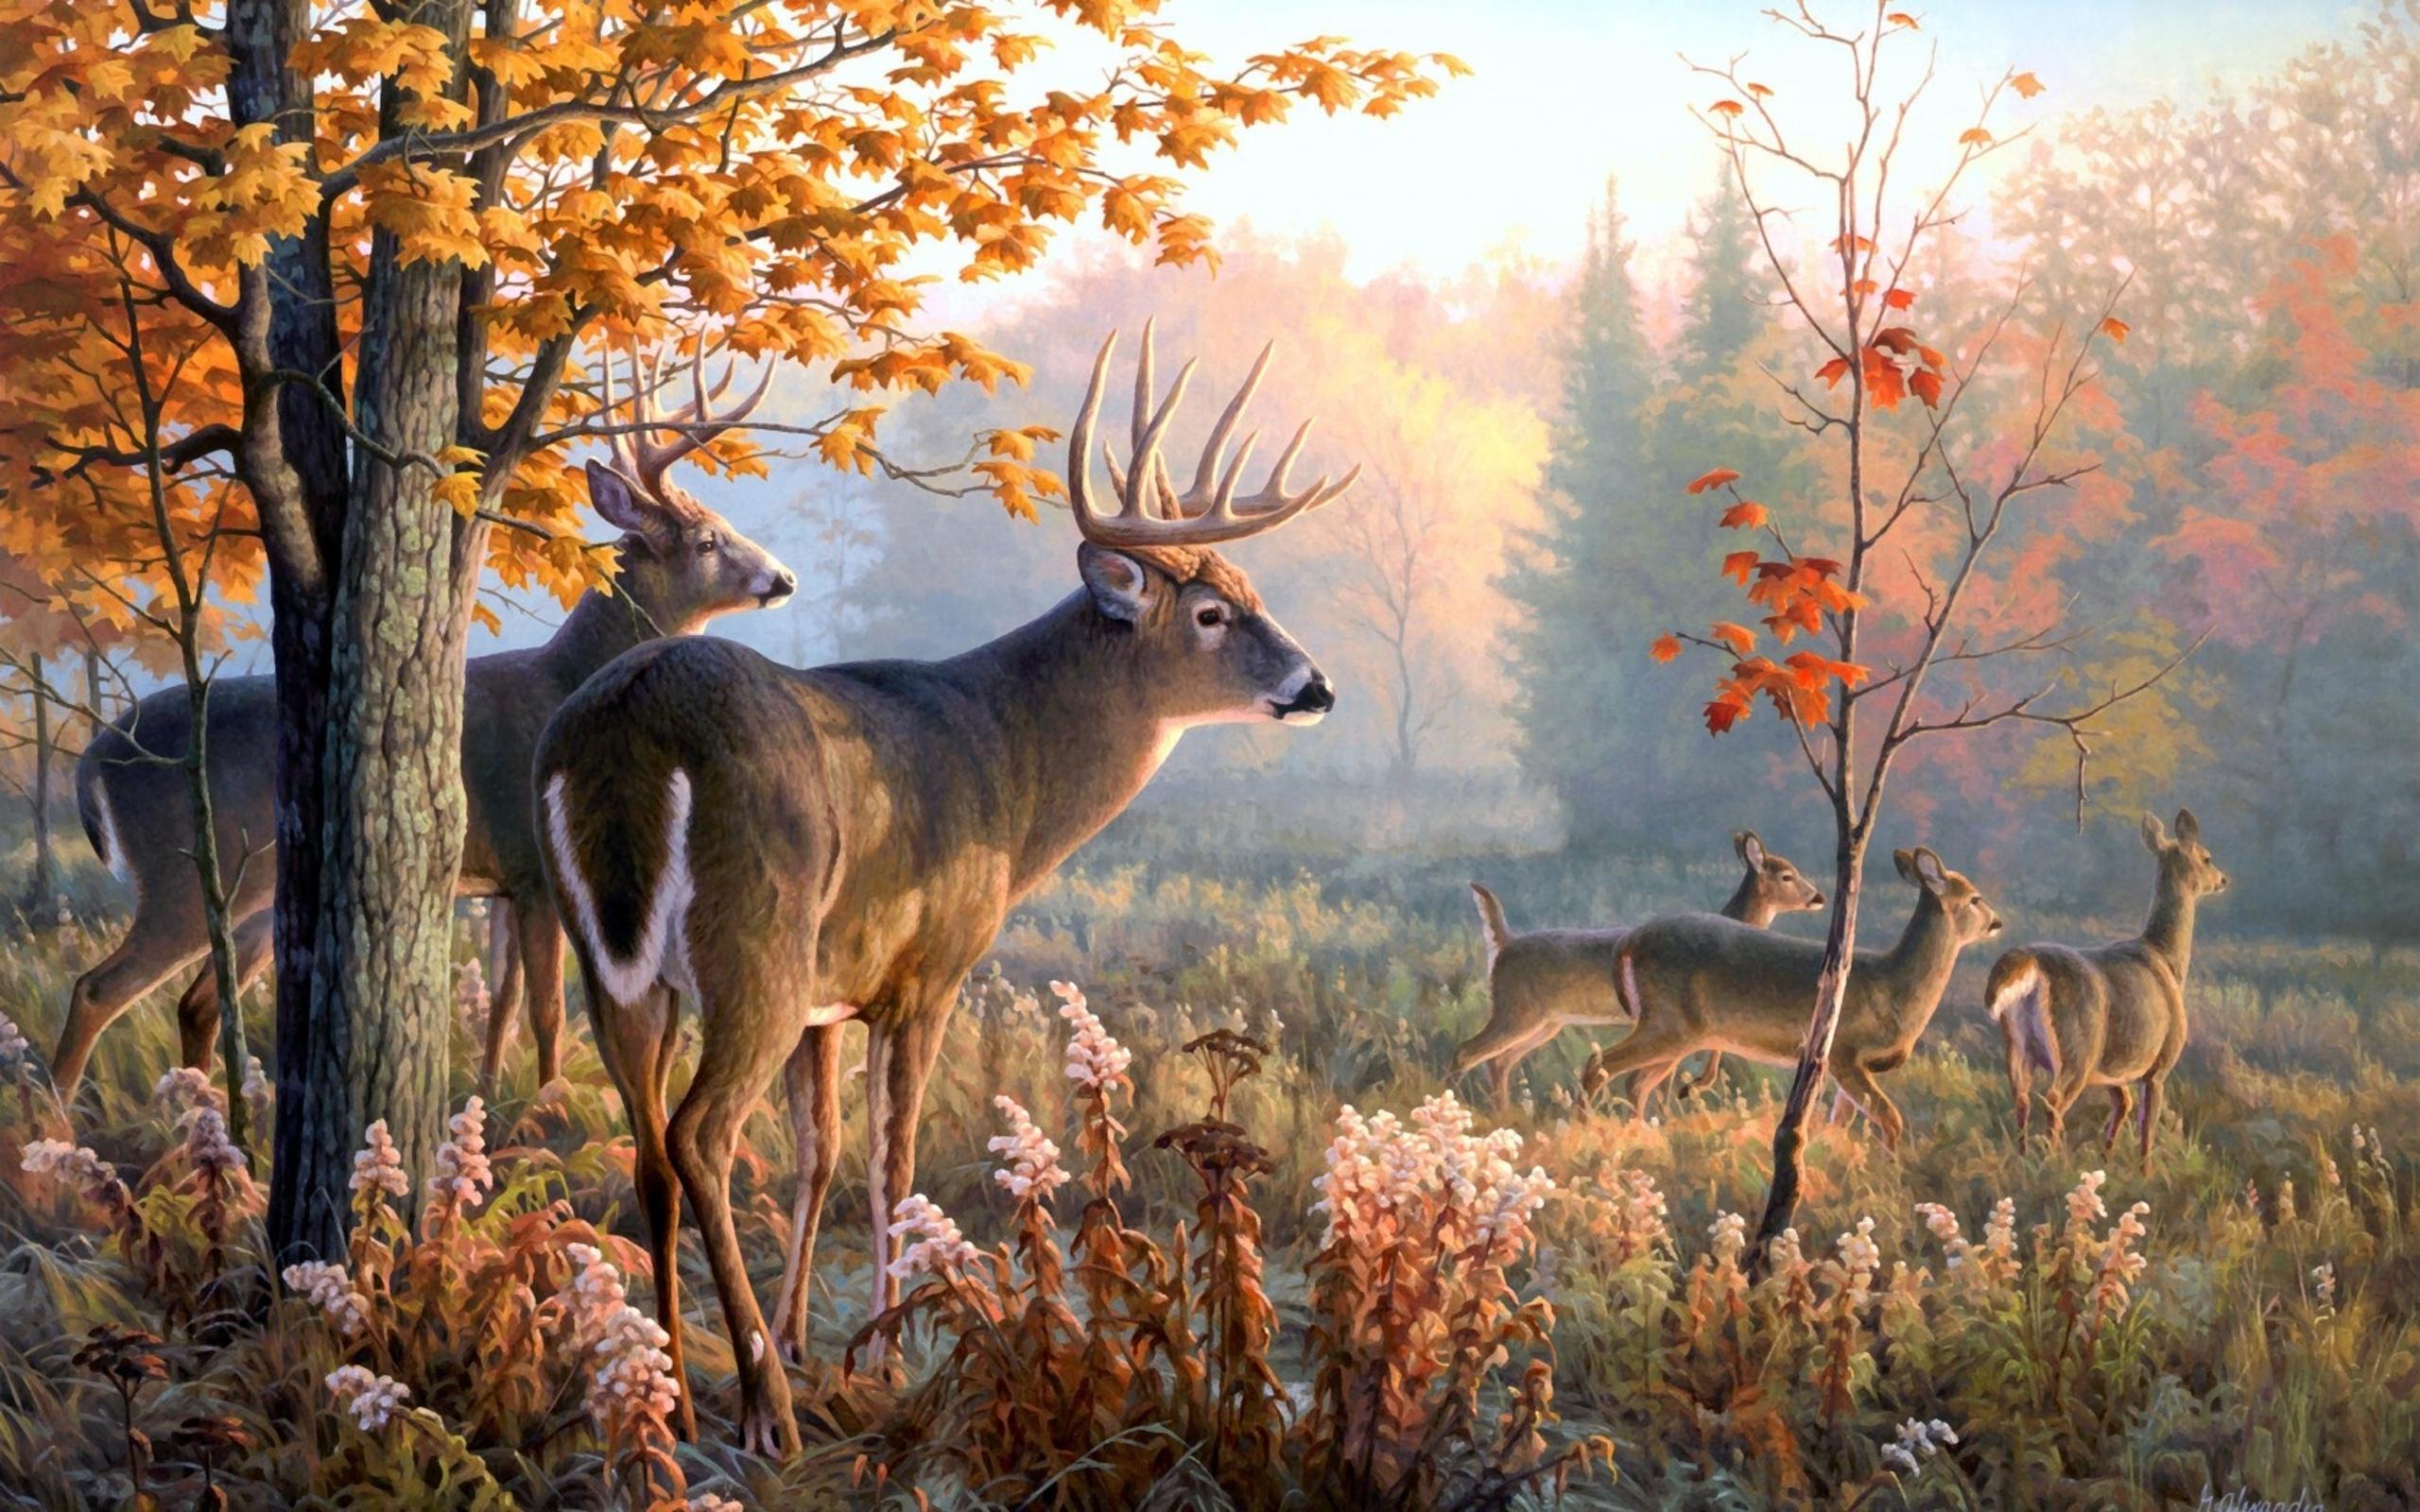 Wallpaper wallpaper Deer Art Wallpaper hd wallpaper background 2560x1600